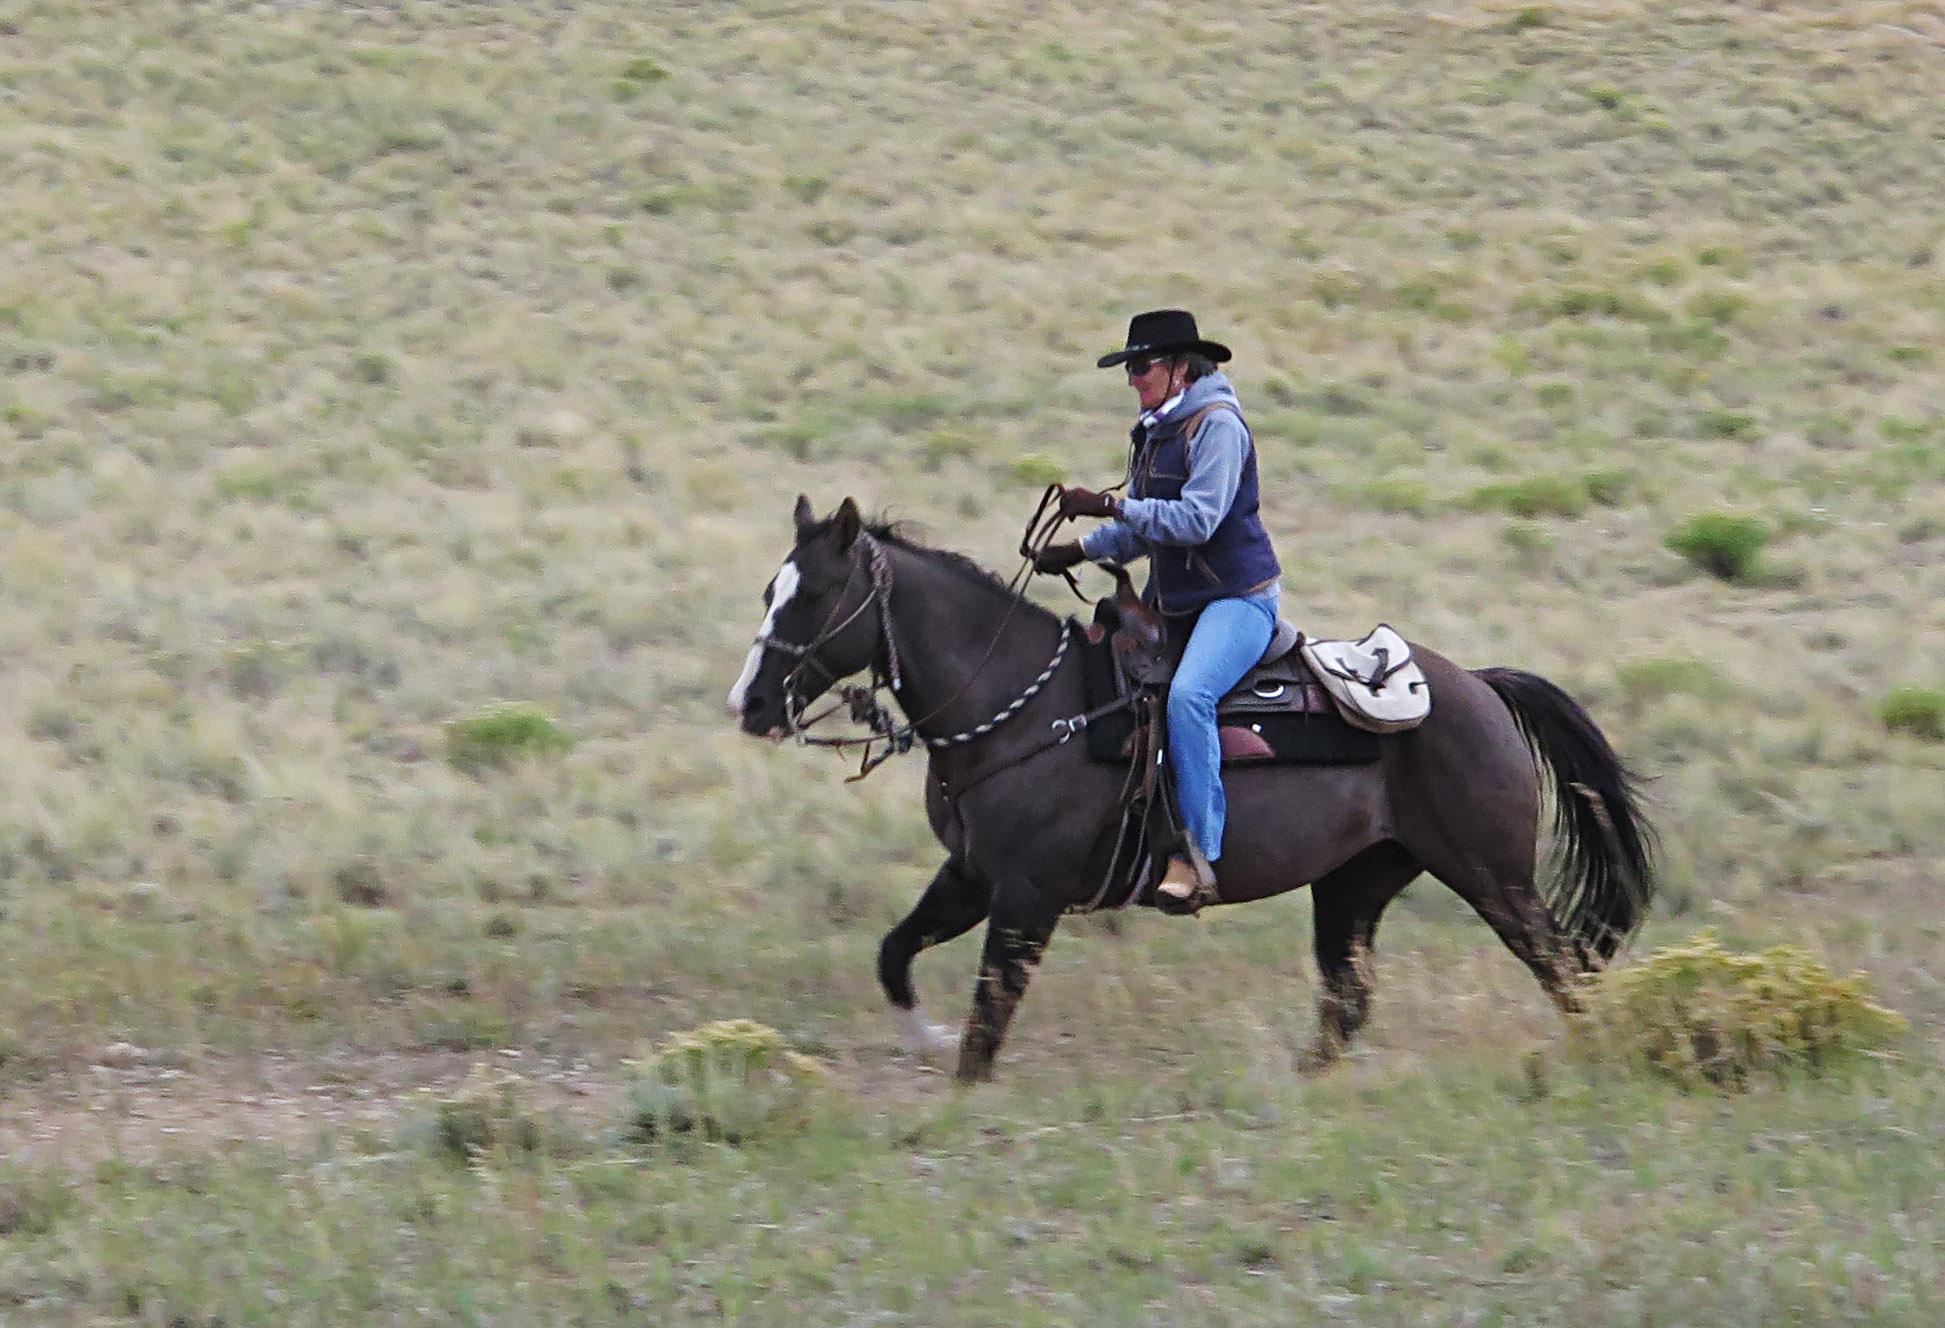 man-riding-horse.jpg